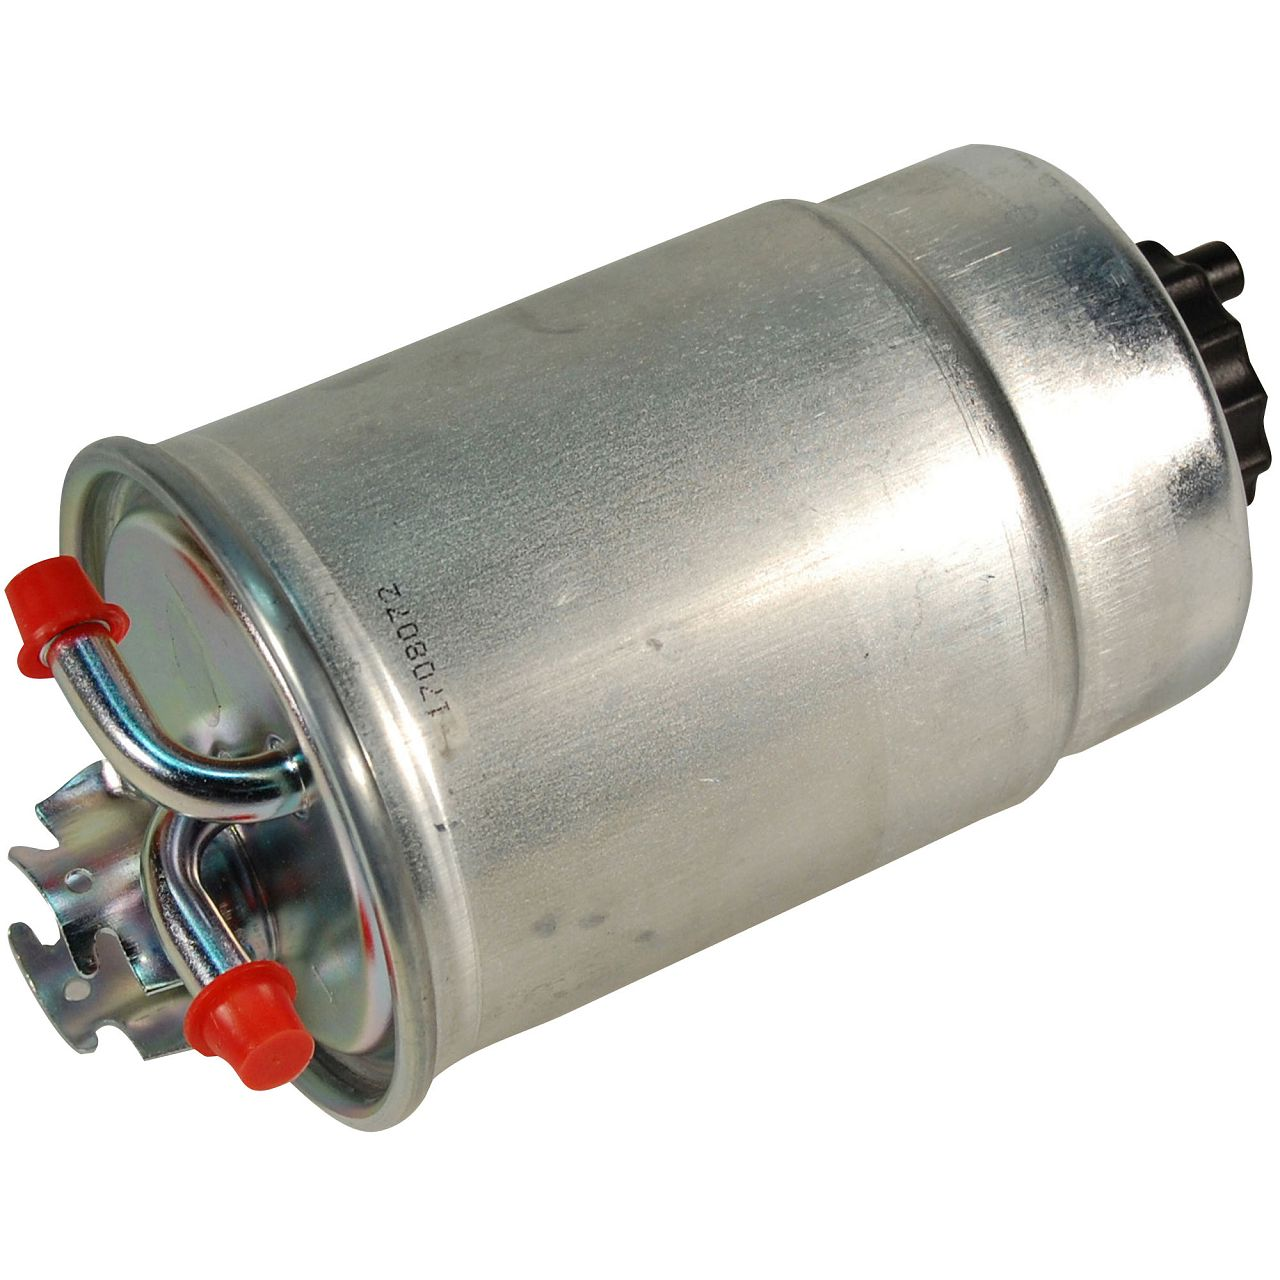 Filterpaket Filterset für VW VENTO GOLF III 1.9TDI 110PS Mot.Code AFN